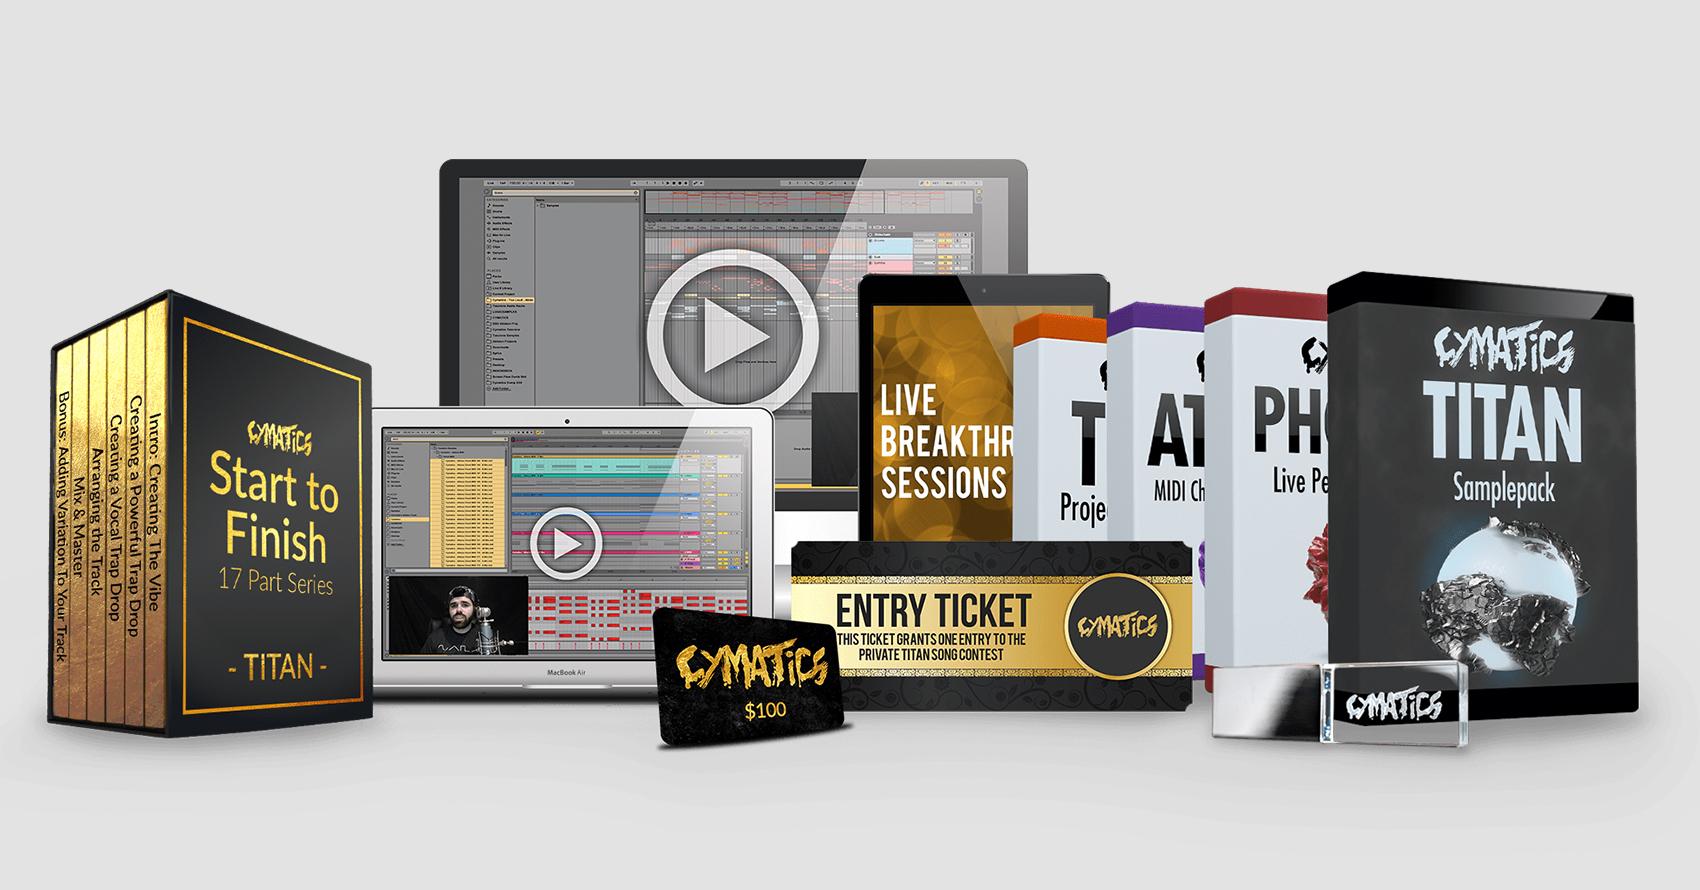 REVIEW: Cymatics Titan Samplepack | Your EDM